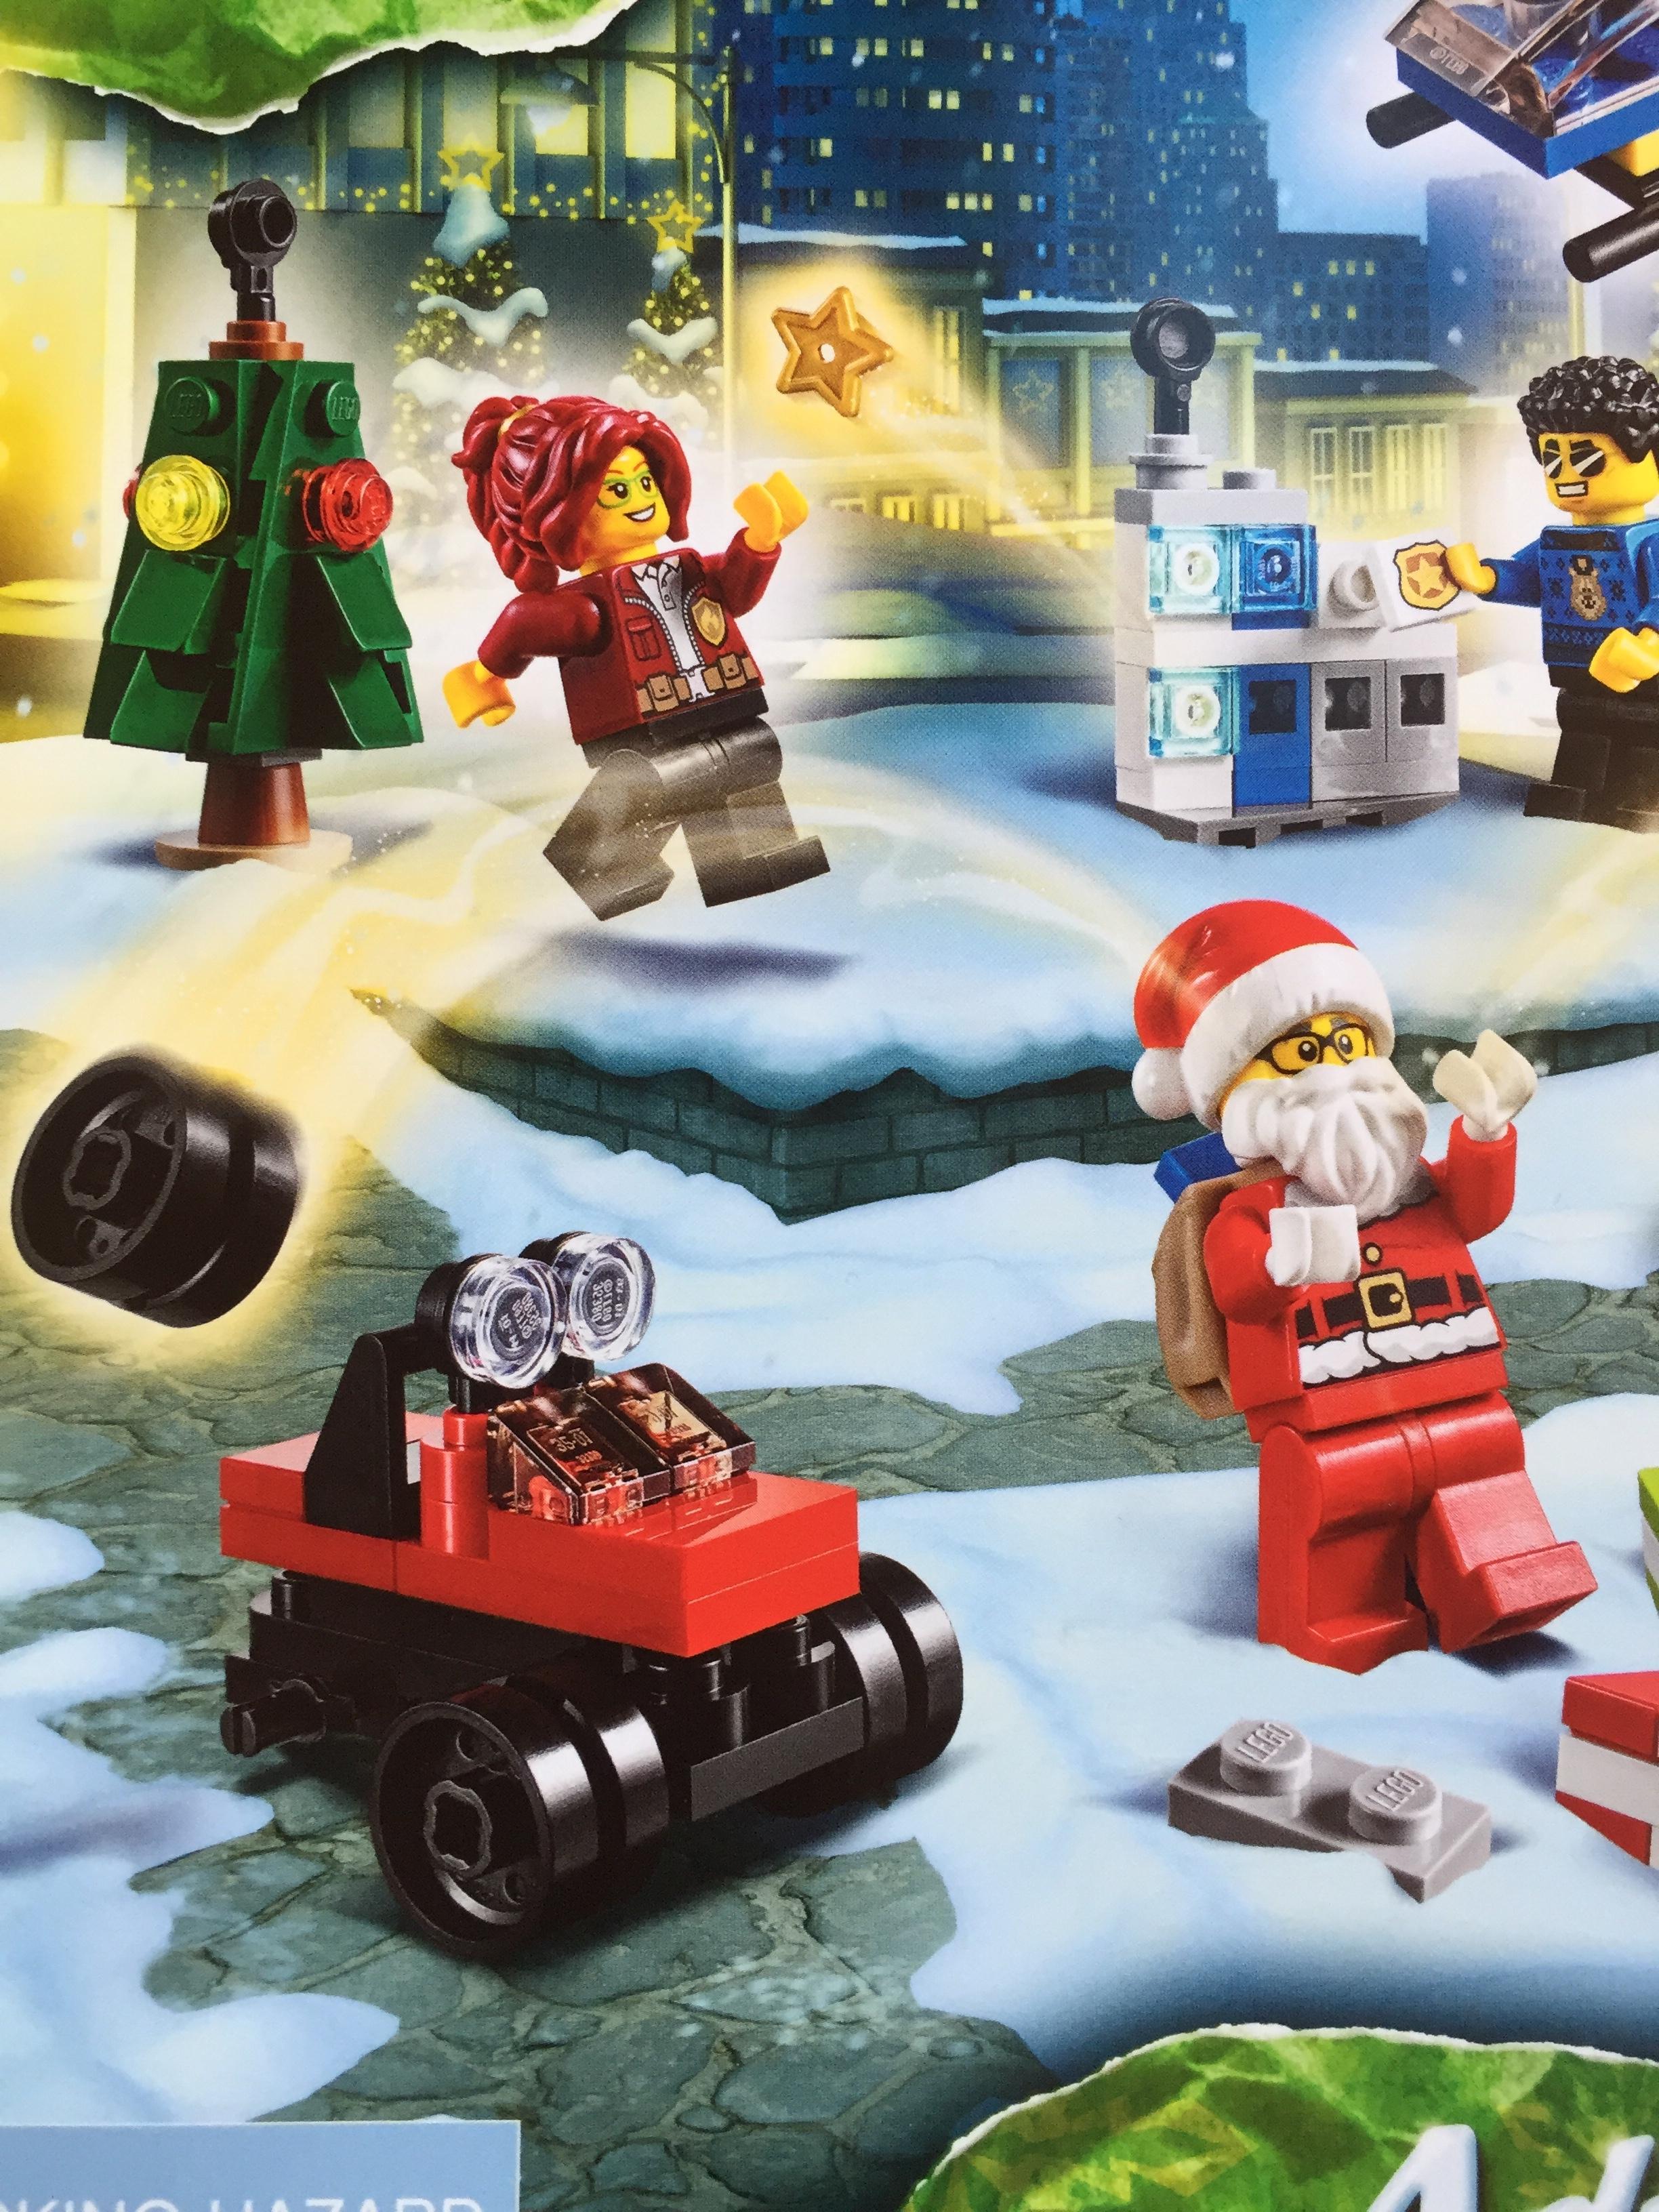 Lego City 2020 Kid Advent Calendar box close up on Santa,